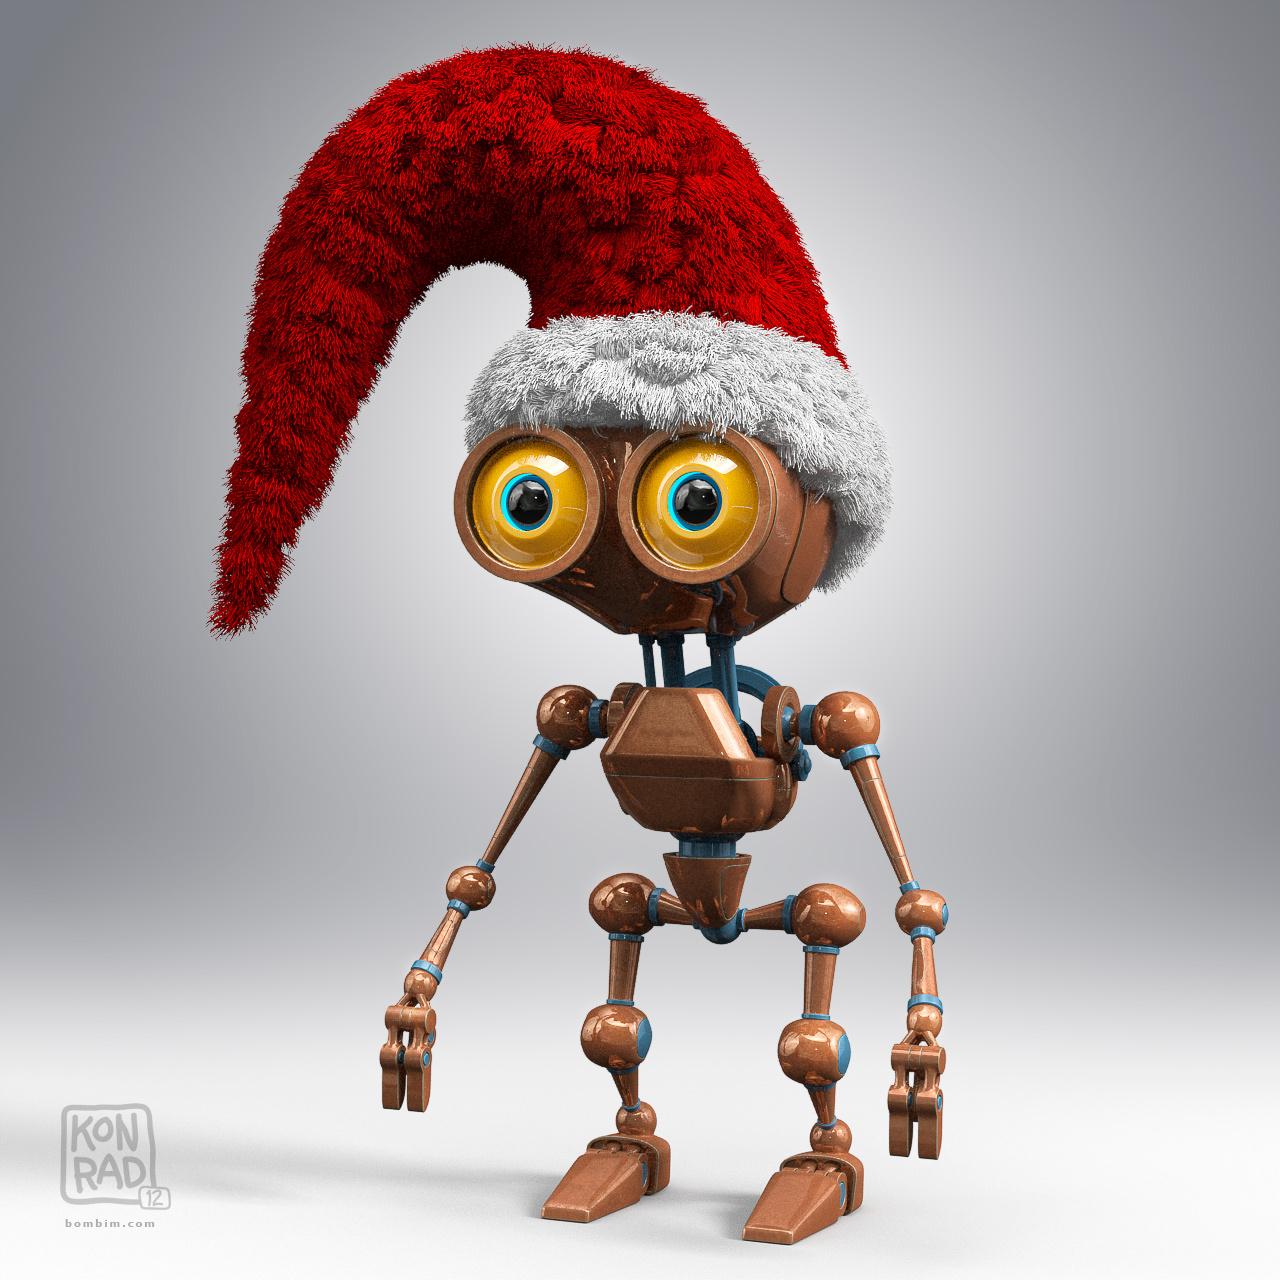 Peter eriksson christmas robot 1 f1854649 suhn